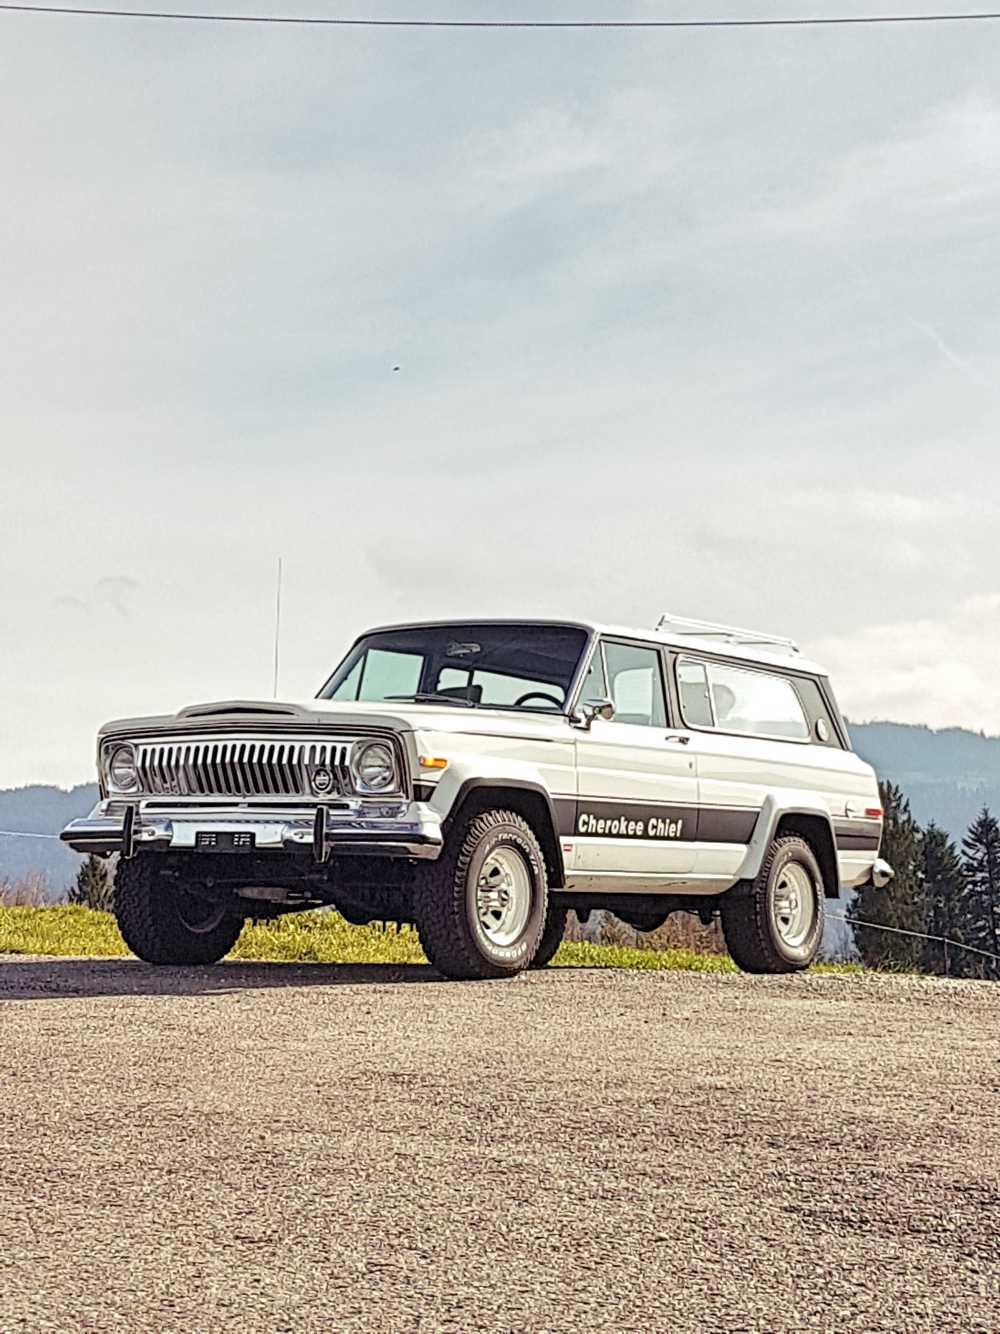 jeep-cherokee-chief-1978-shooting-moleson-6